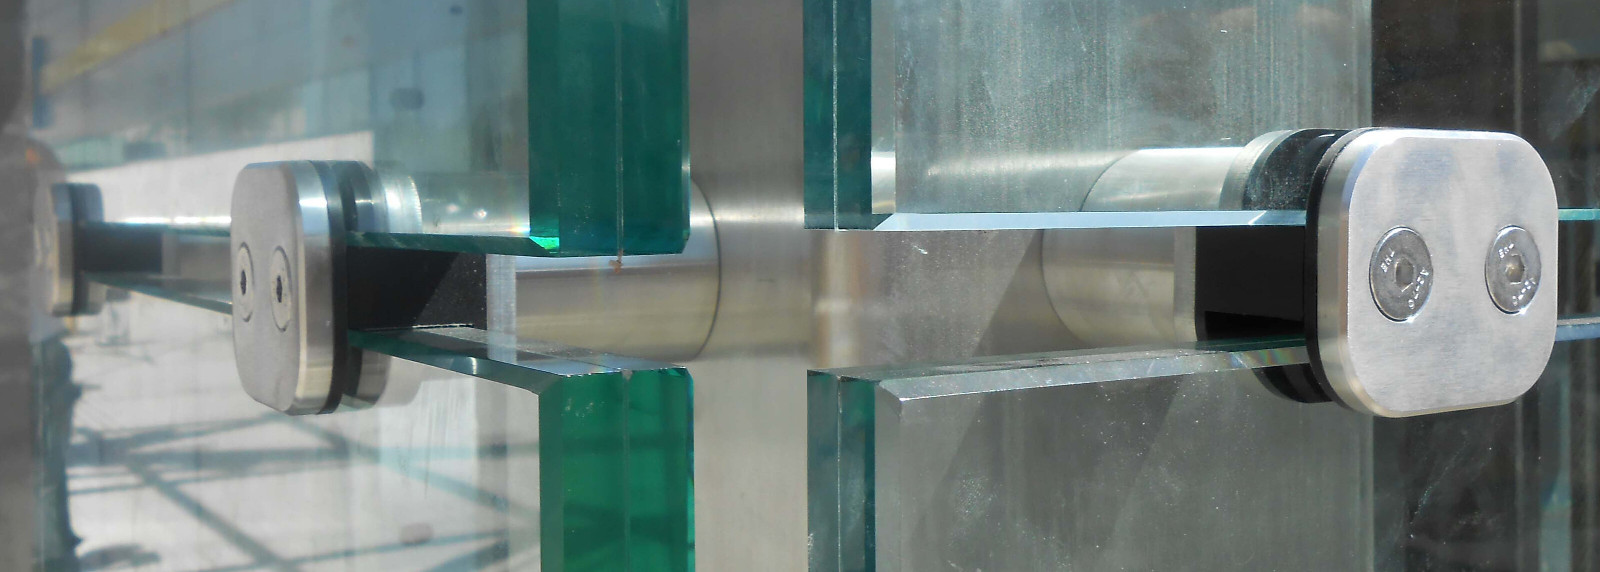 Herrajes estructurales vidrio ingadesa